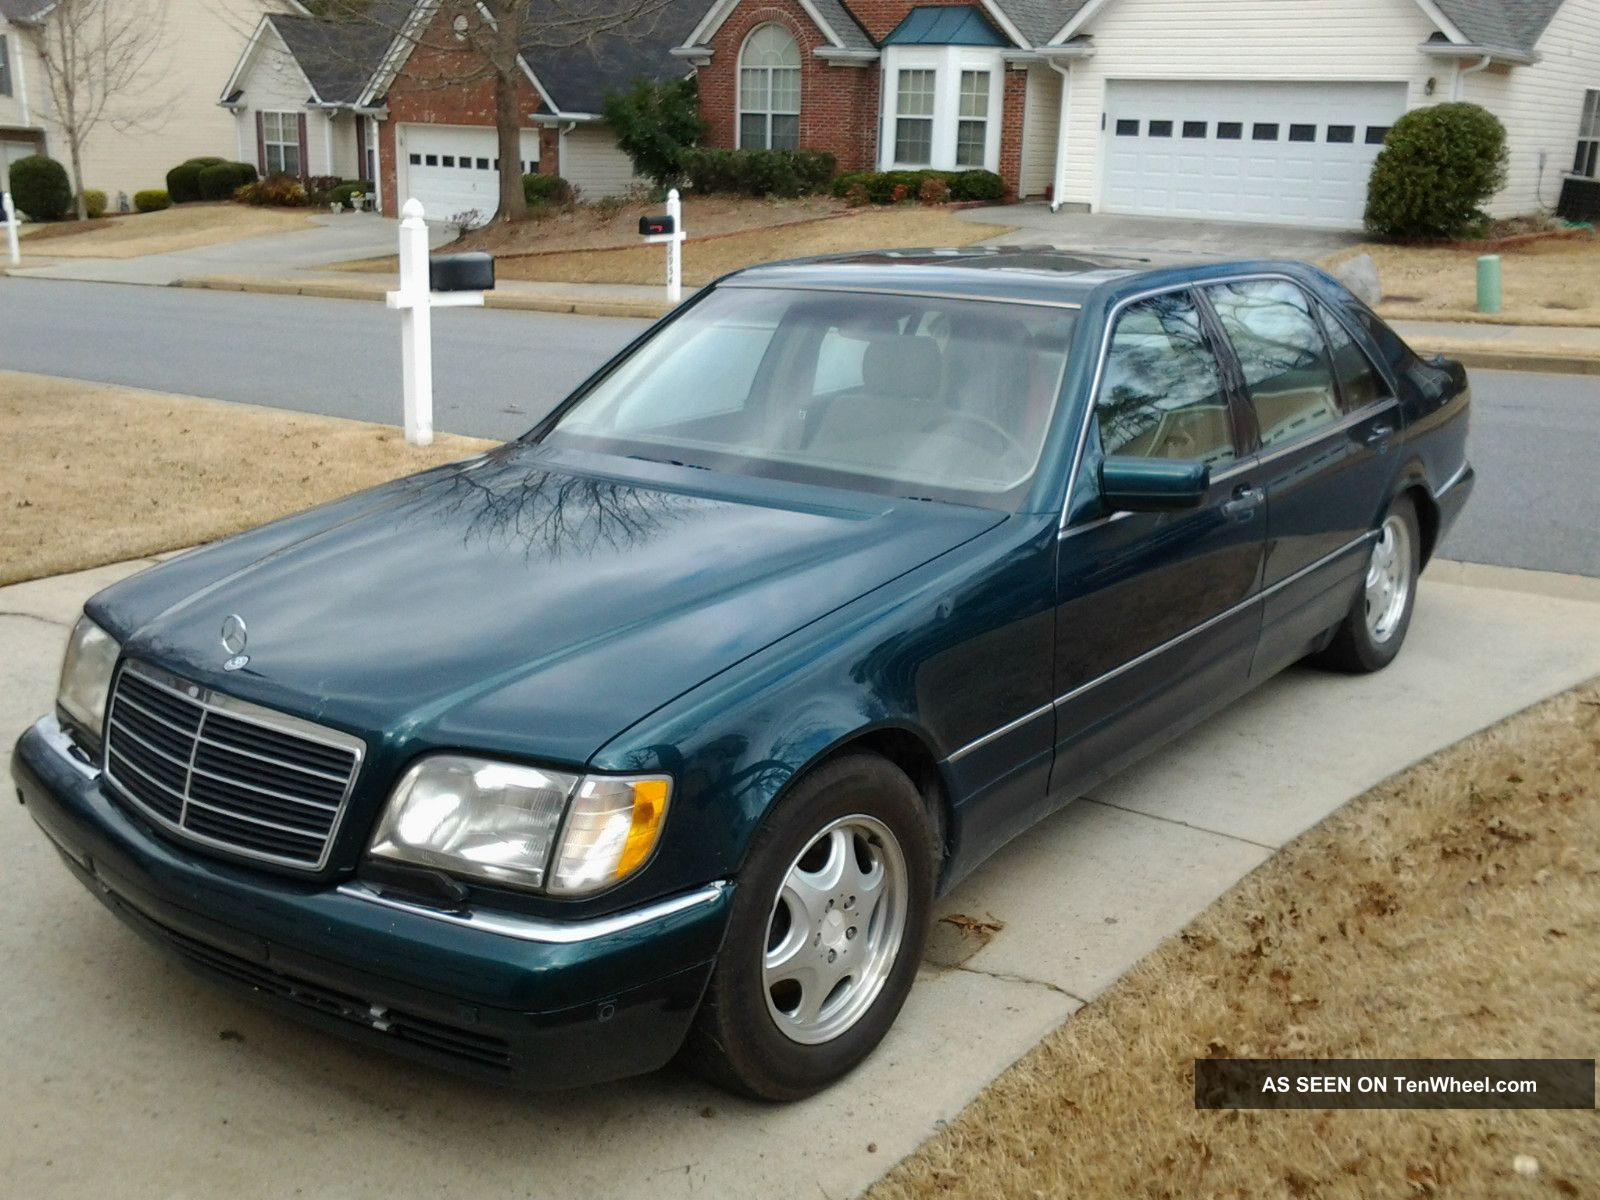 Mercedes benz s500 1997 palamino seats interior dark for Green mercedes benz